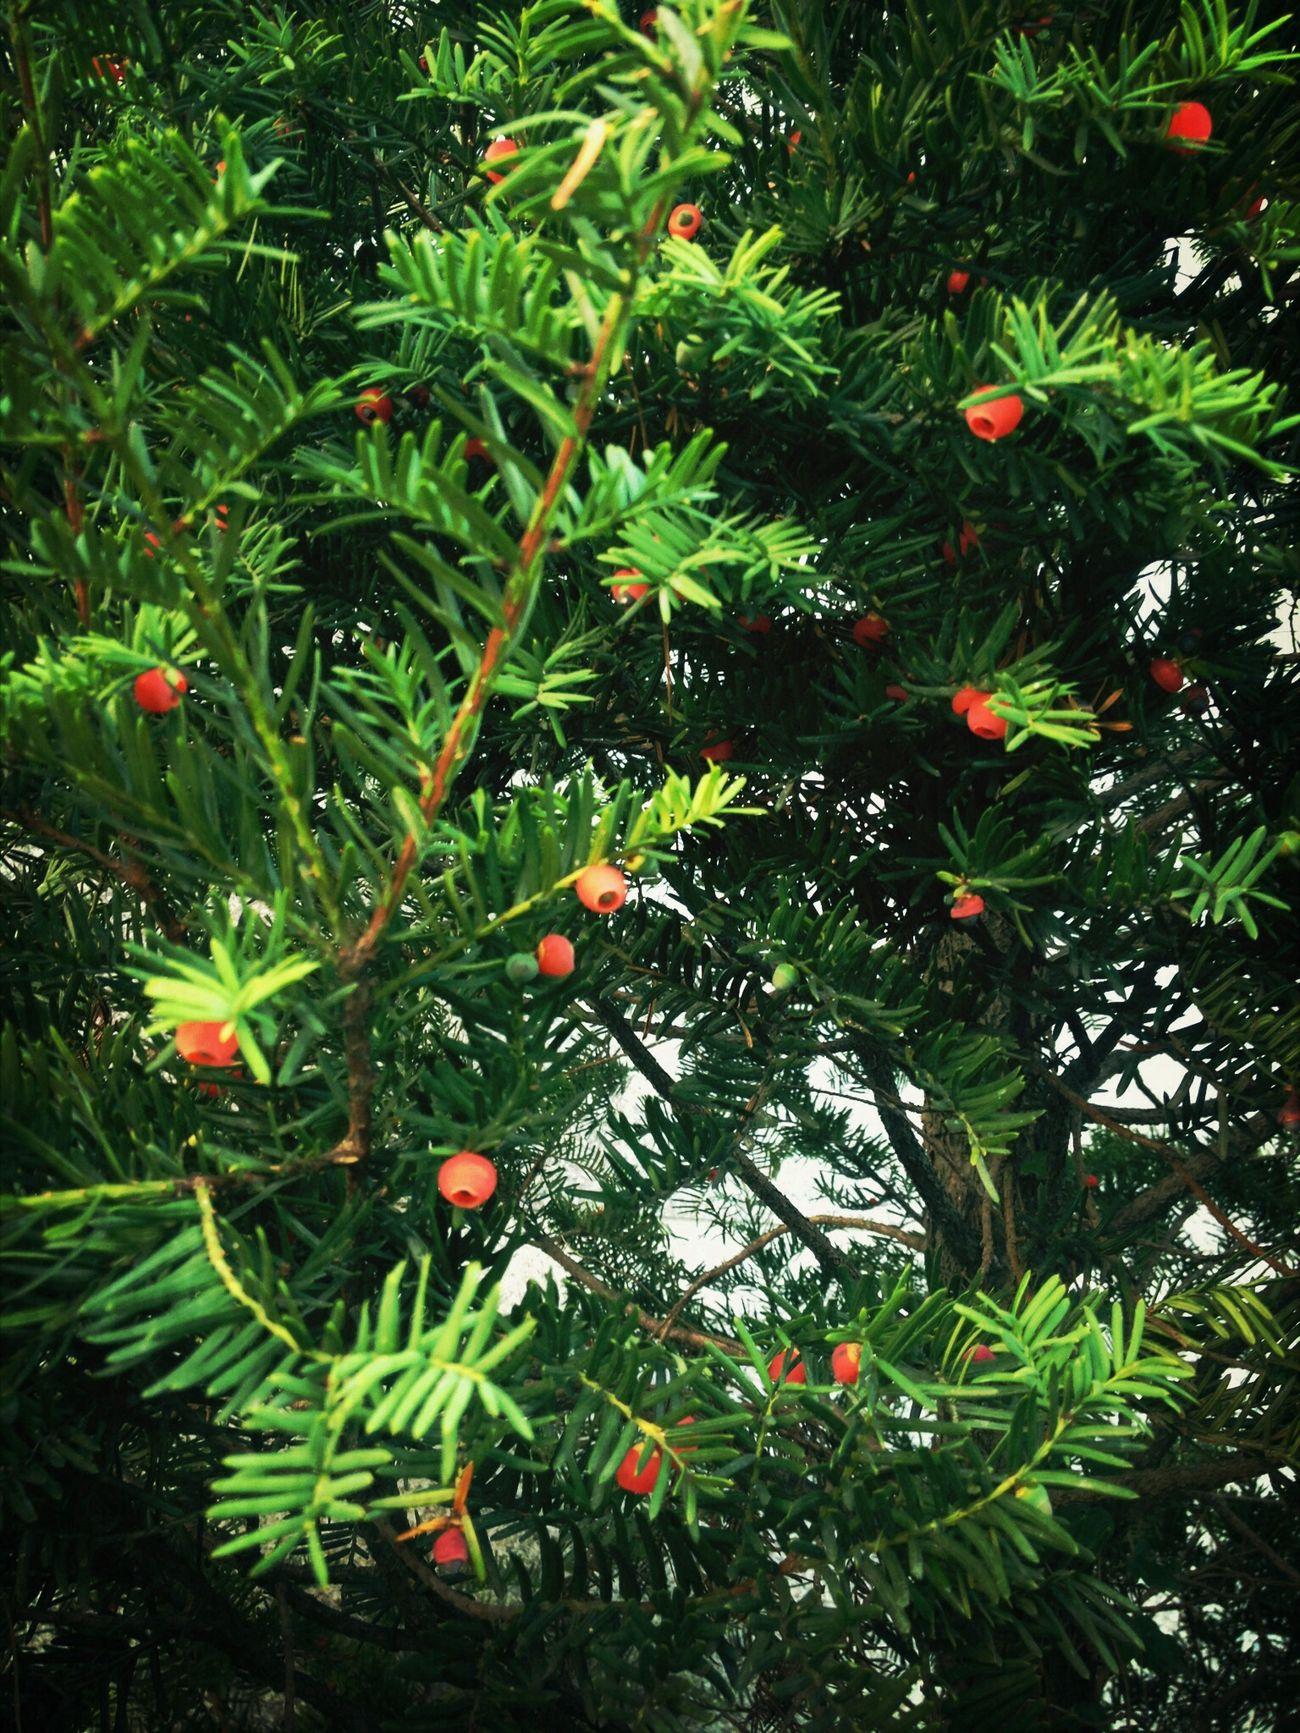 its looks like Christmas Tree ~